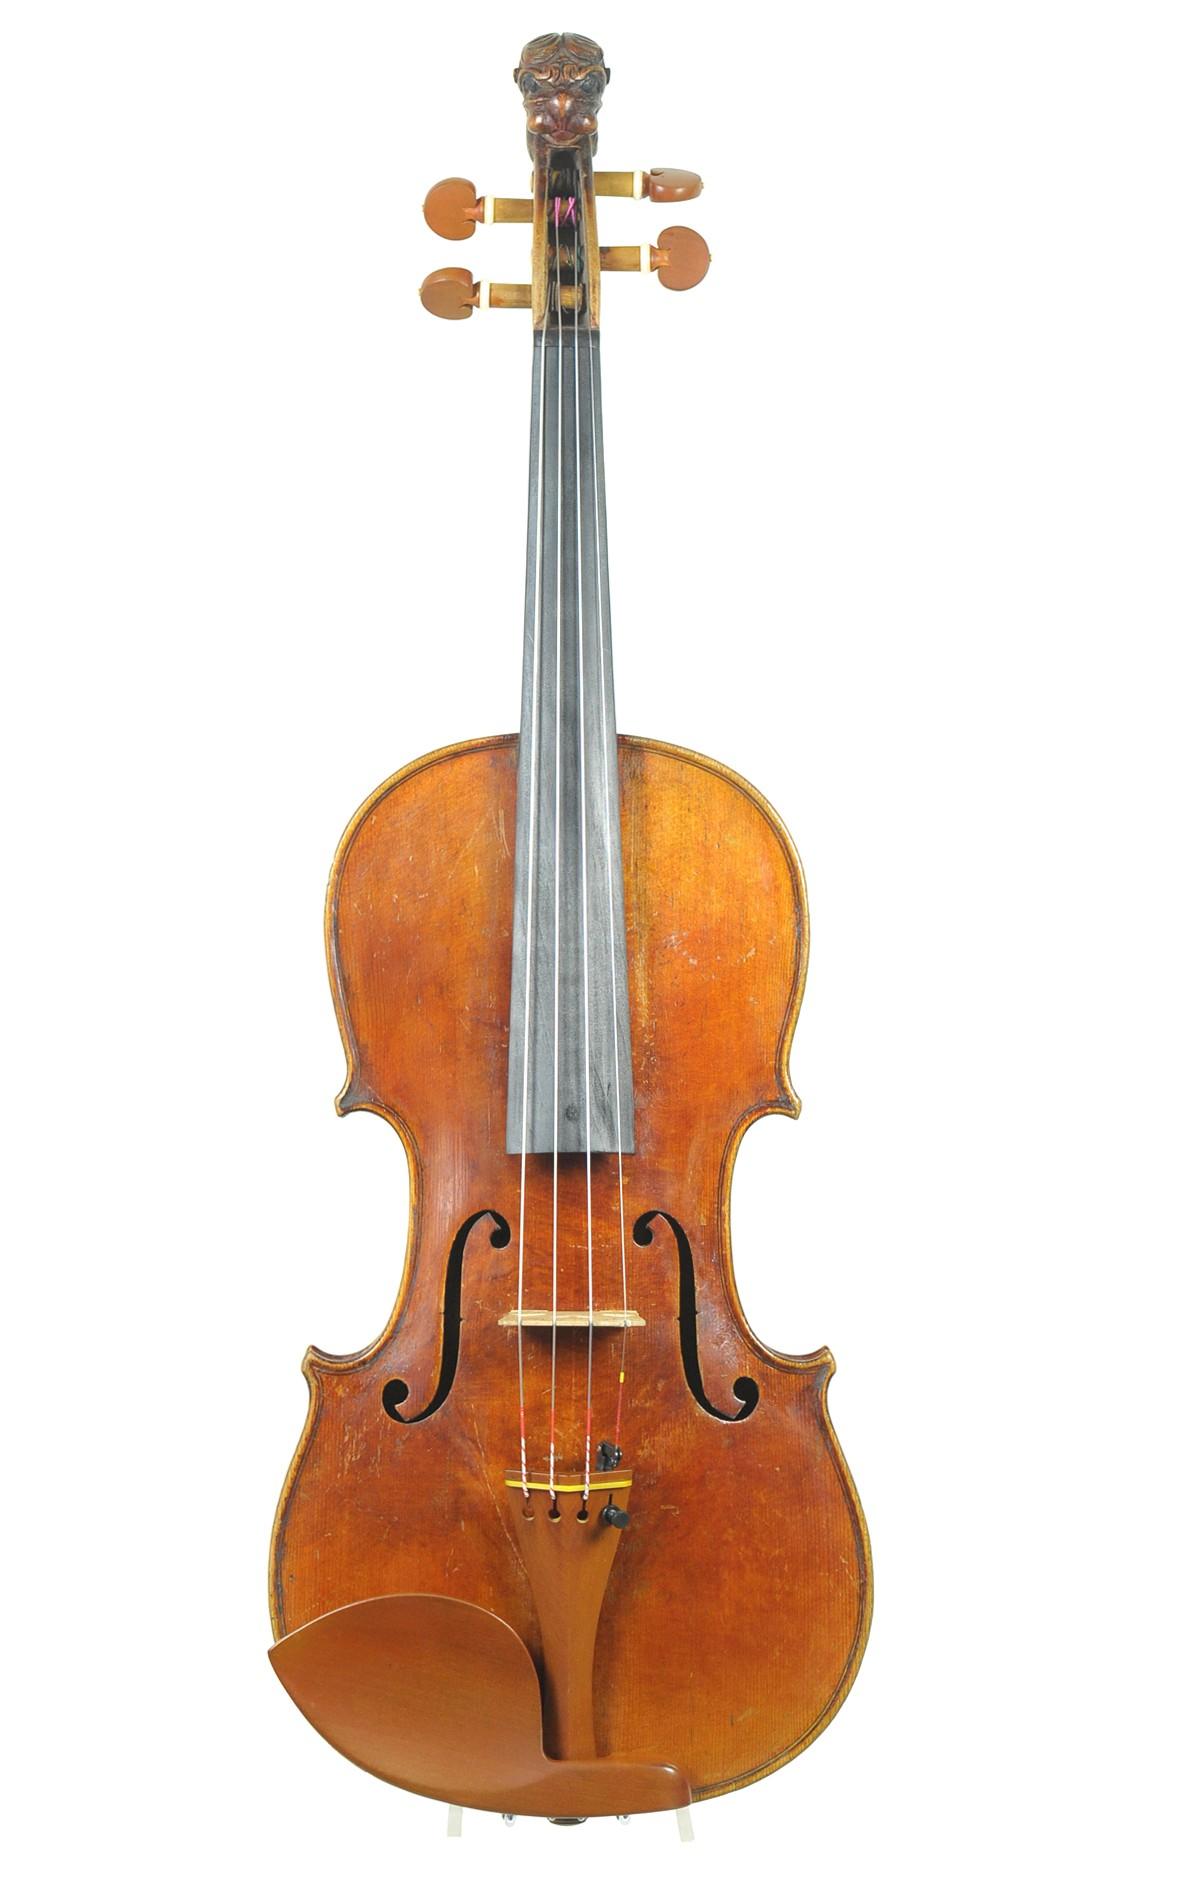 Lion head violin, Mittenwald 19th century